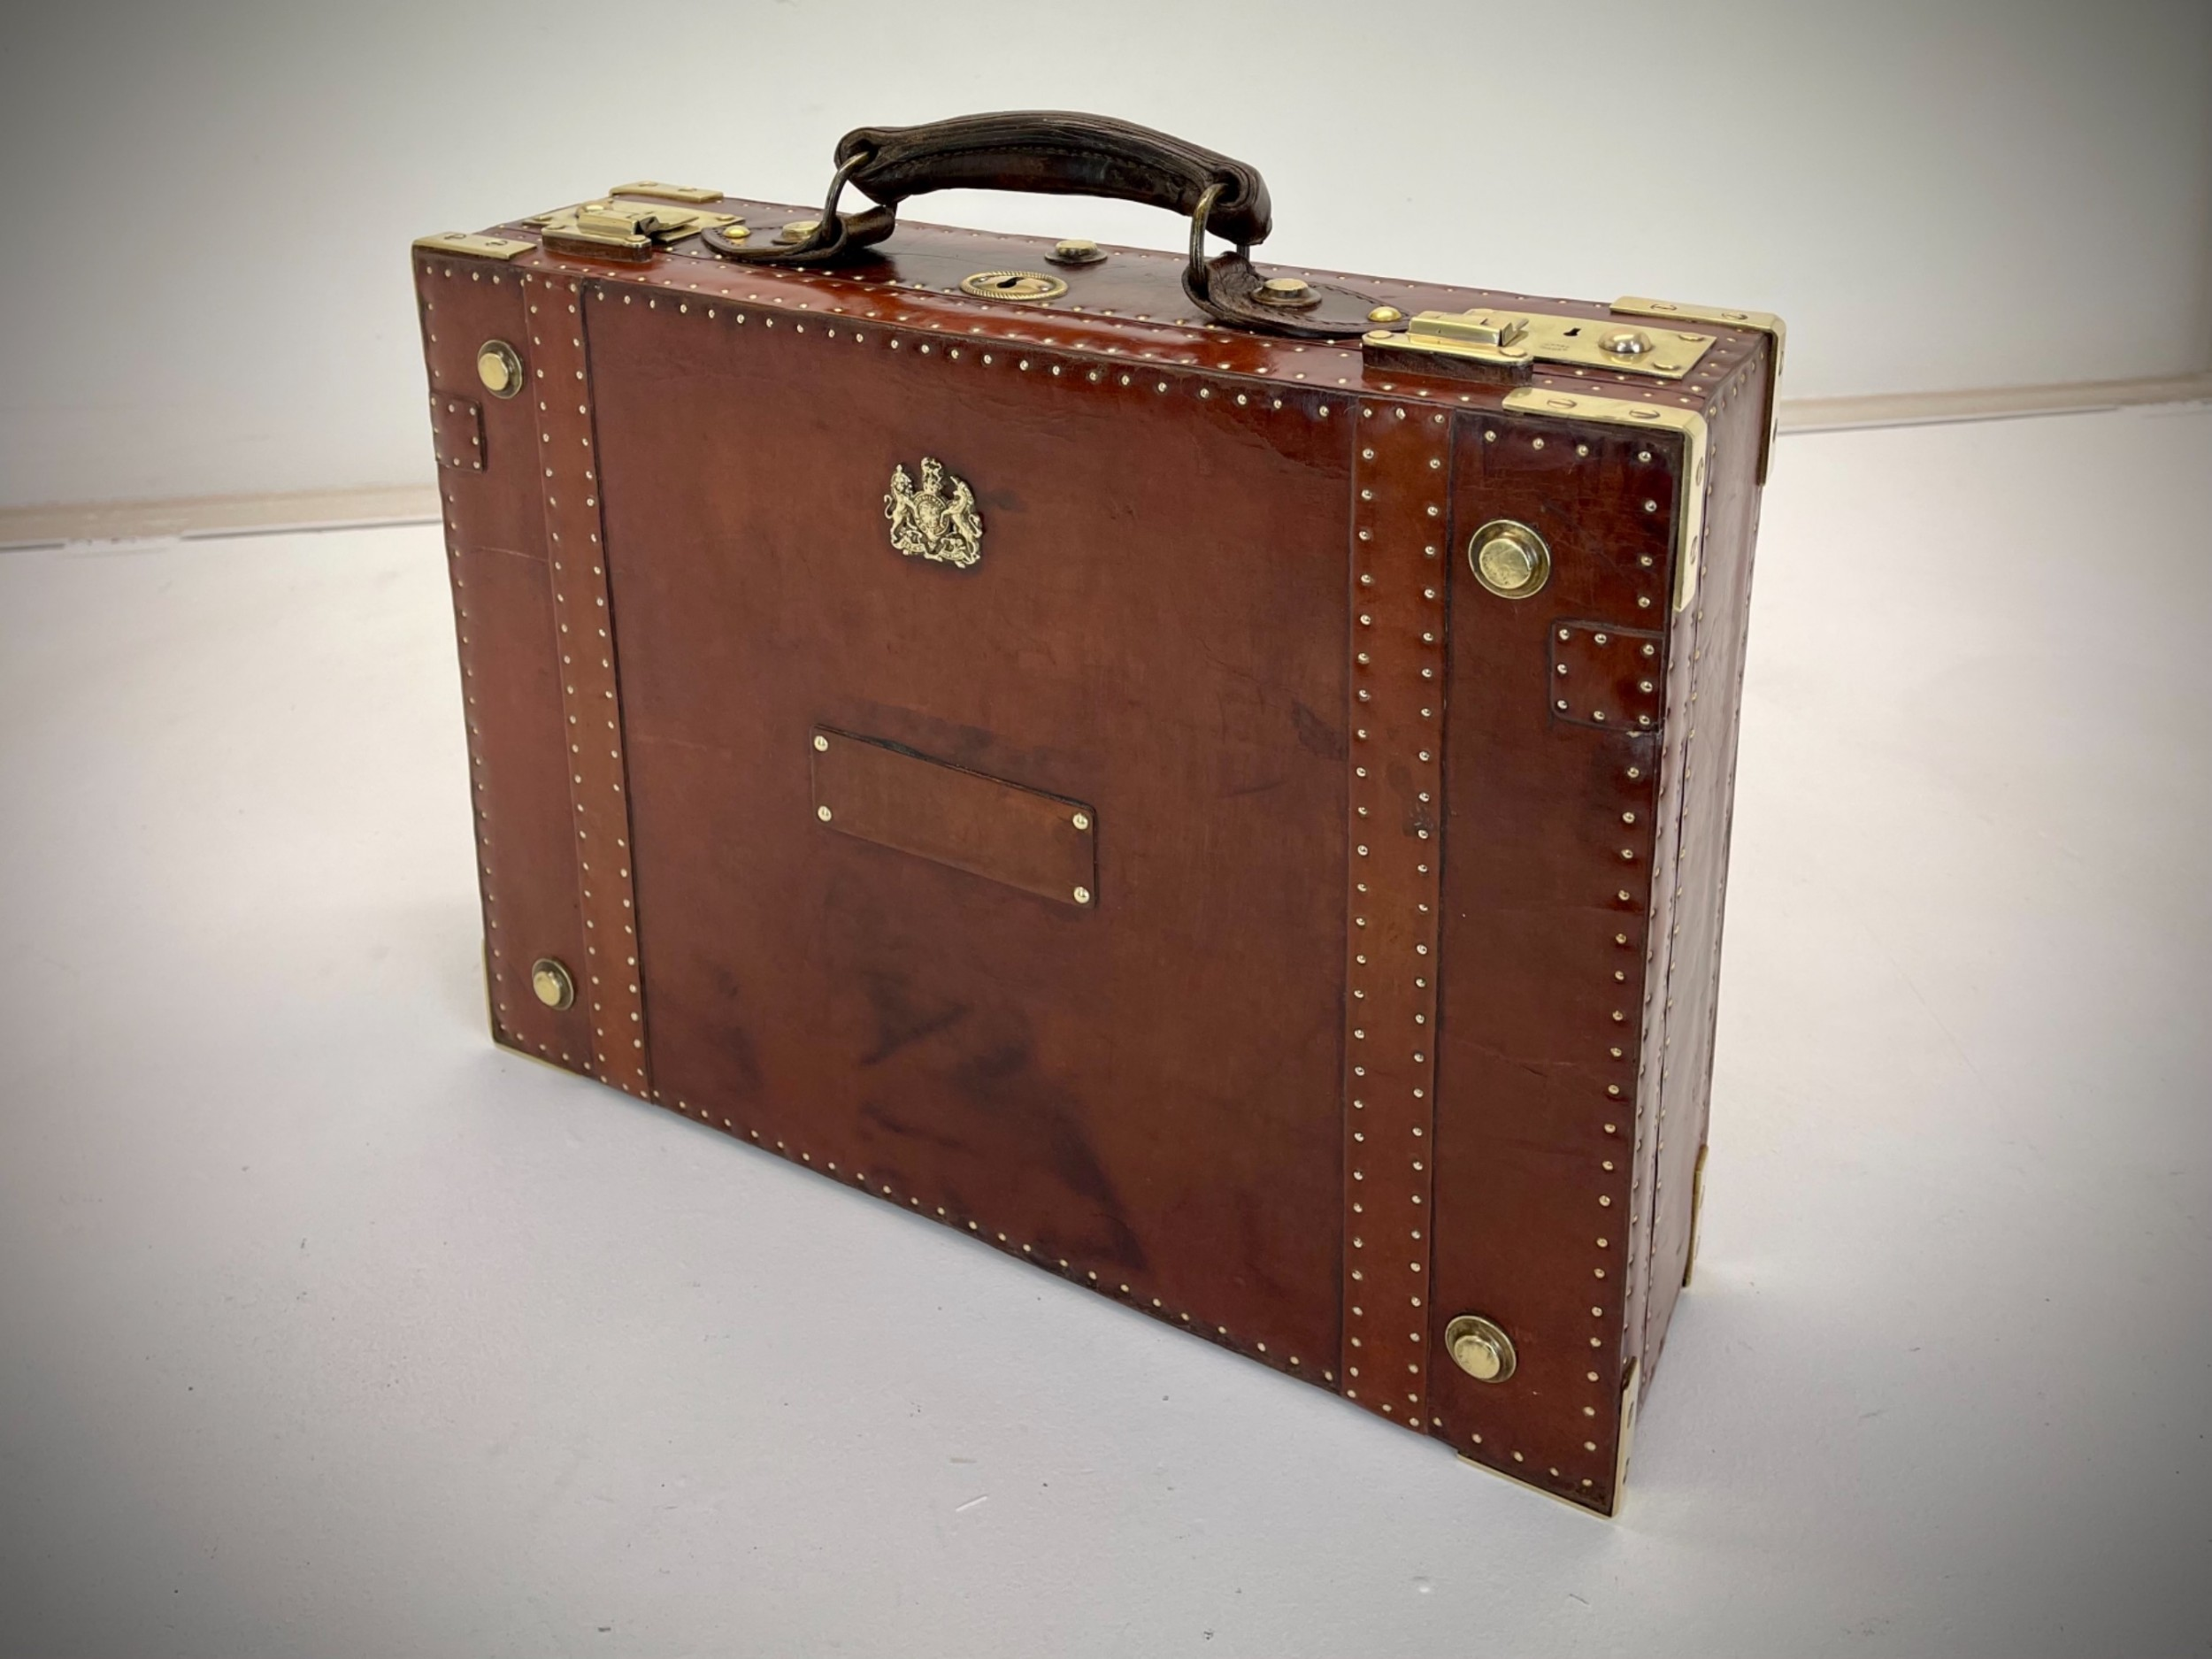 vintage leather dispatch case briefcase antique travel luggage